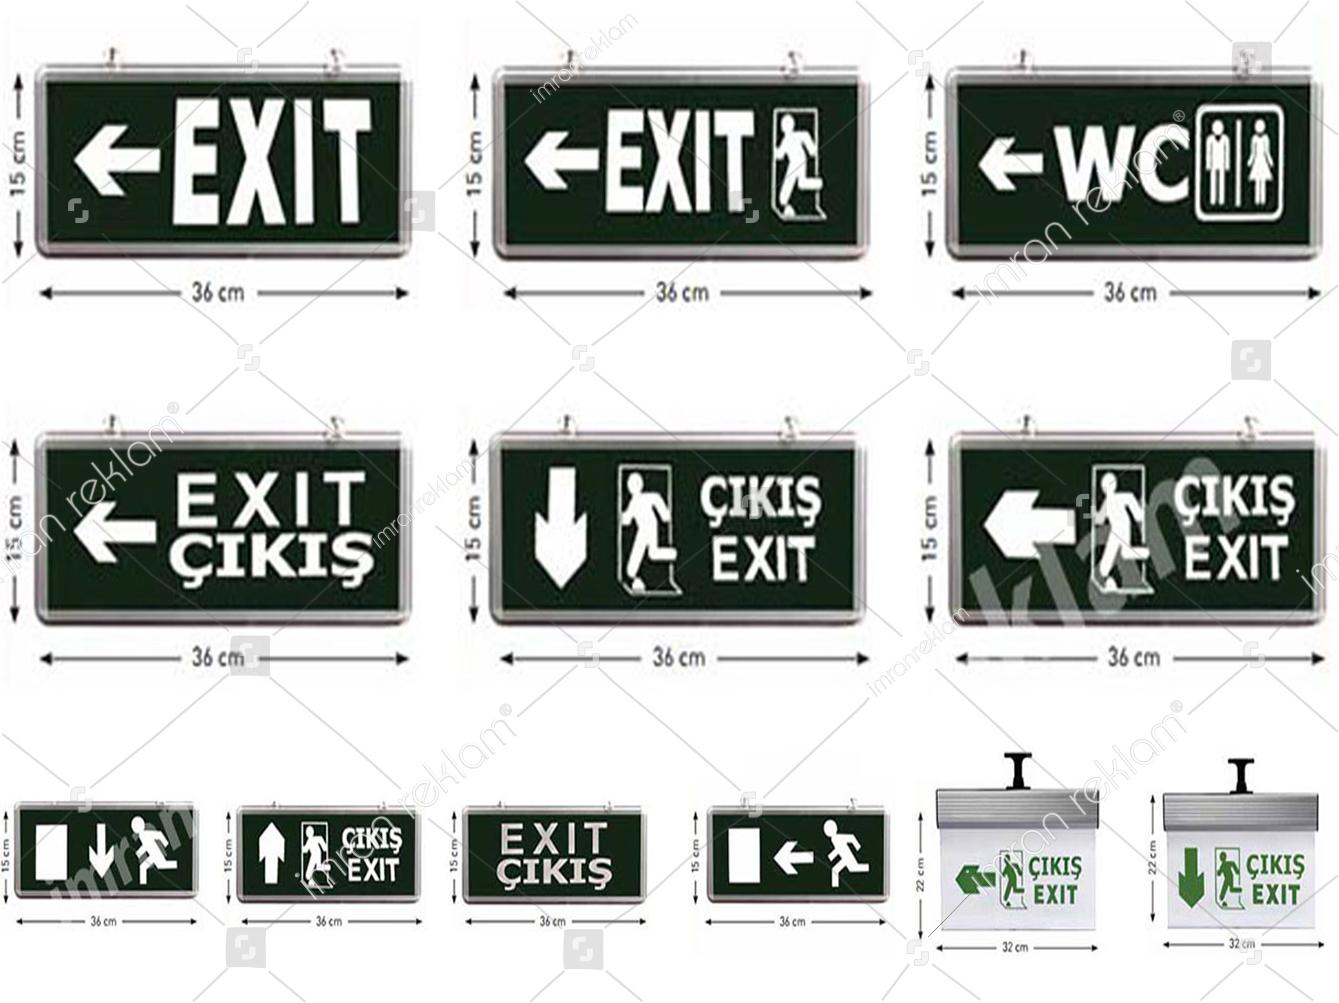 exit-cikis